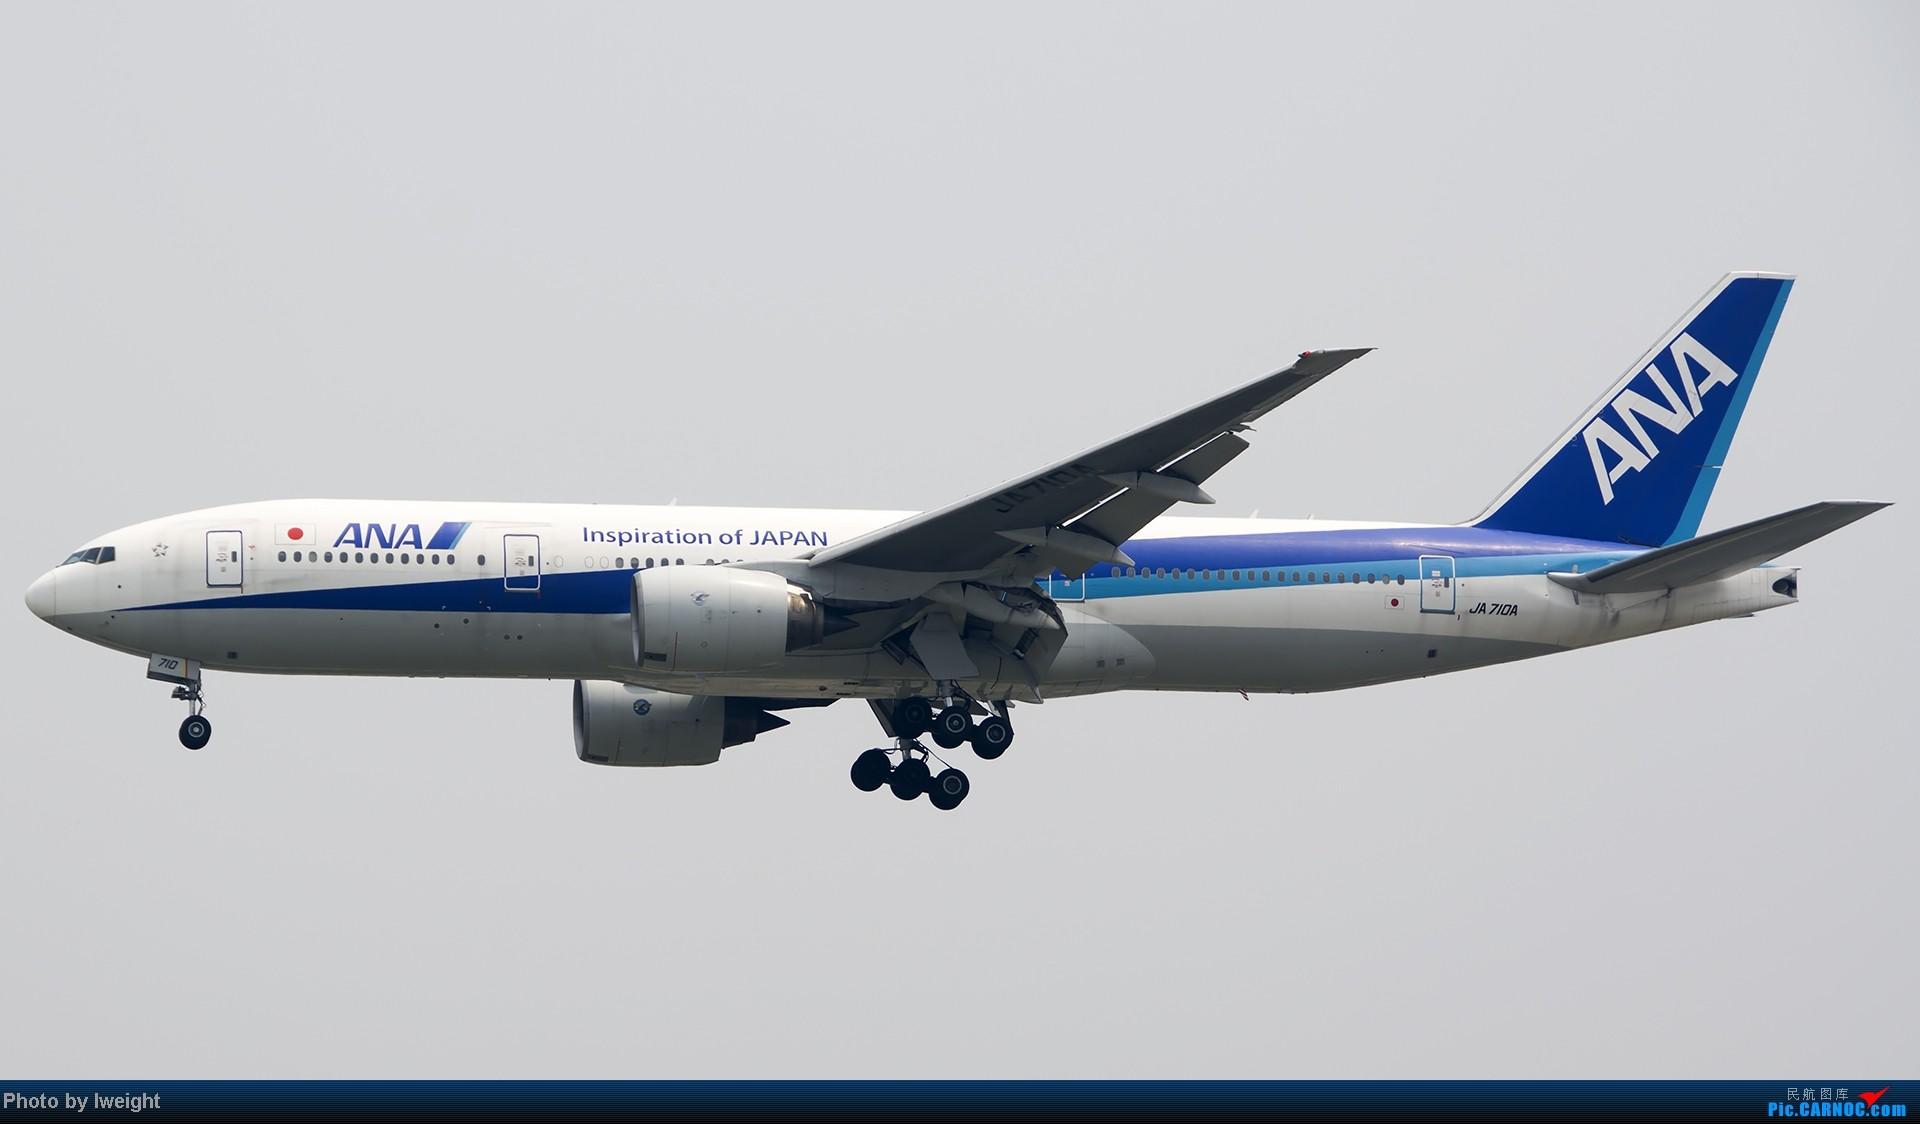 Re:[原创]休假无聊,跑道边来拍机玩(晚点的ZestAir、换装的B6100和刚交付的B2738等) BOEING 777-200  中国北京首都机场